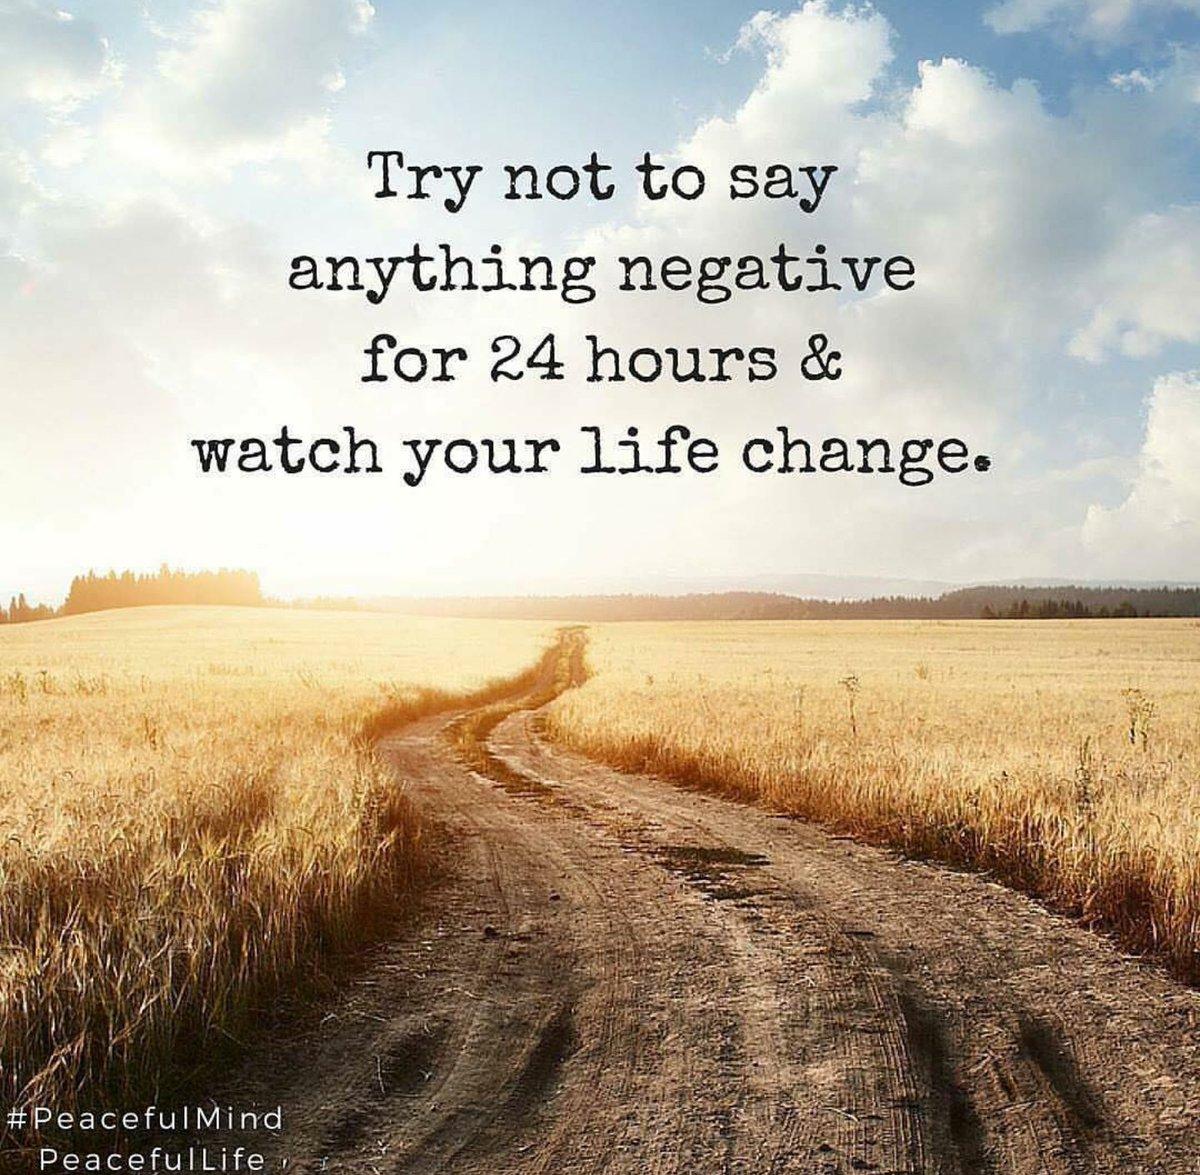 Positivity is the key!!! #MondayMotivation <br>http://pic.twitter.com/RkqvwLfcB8